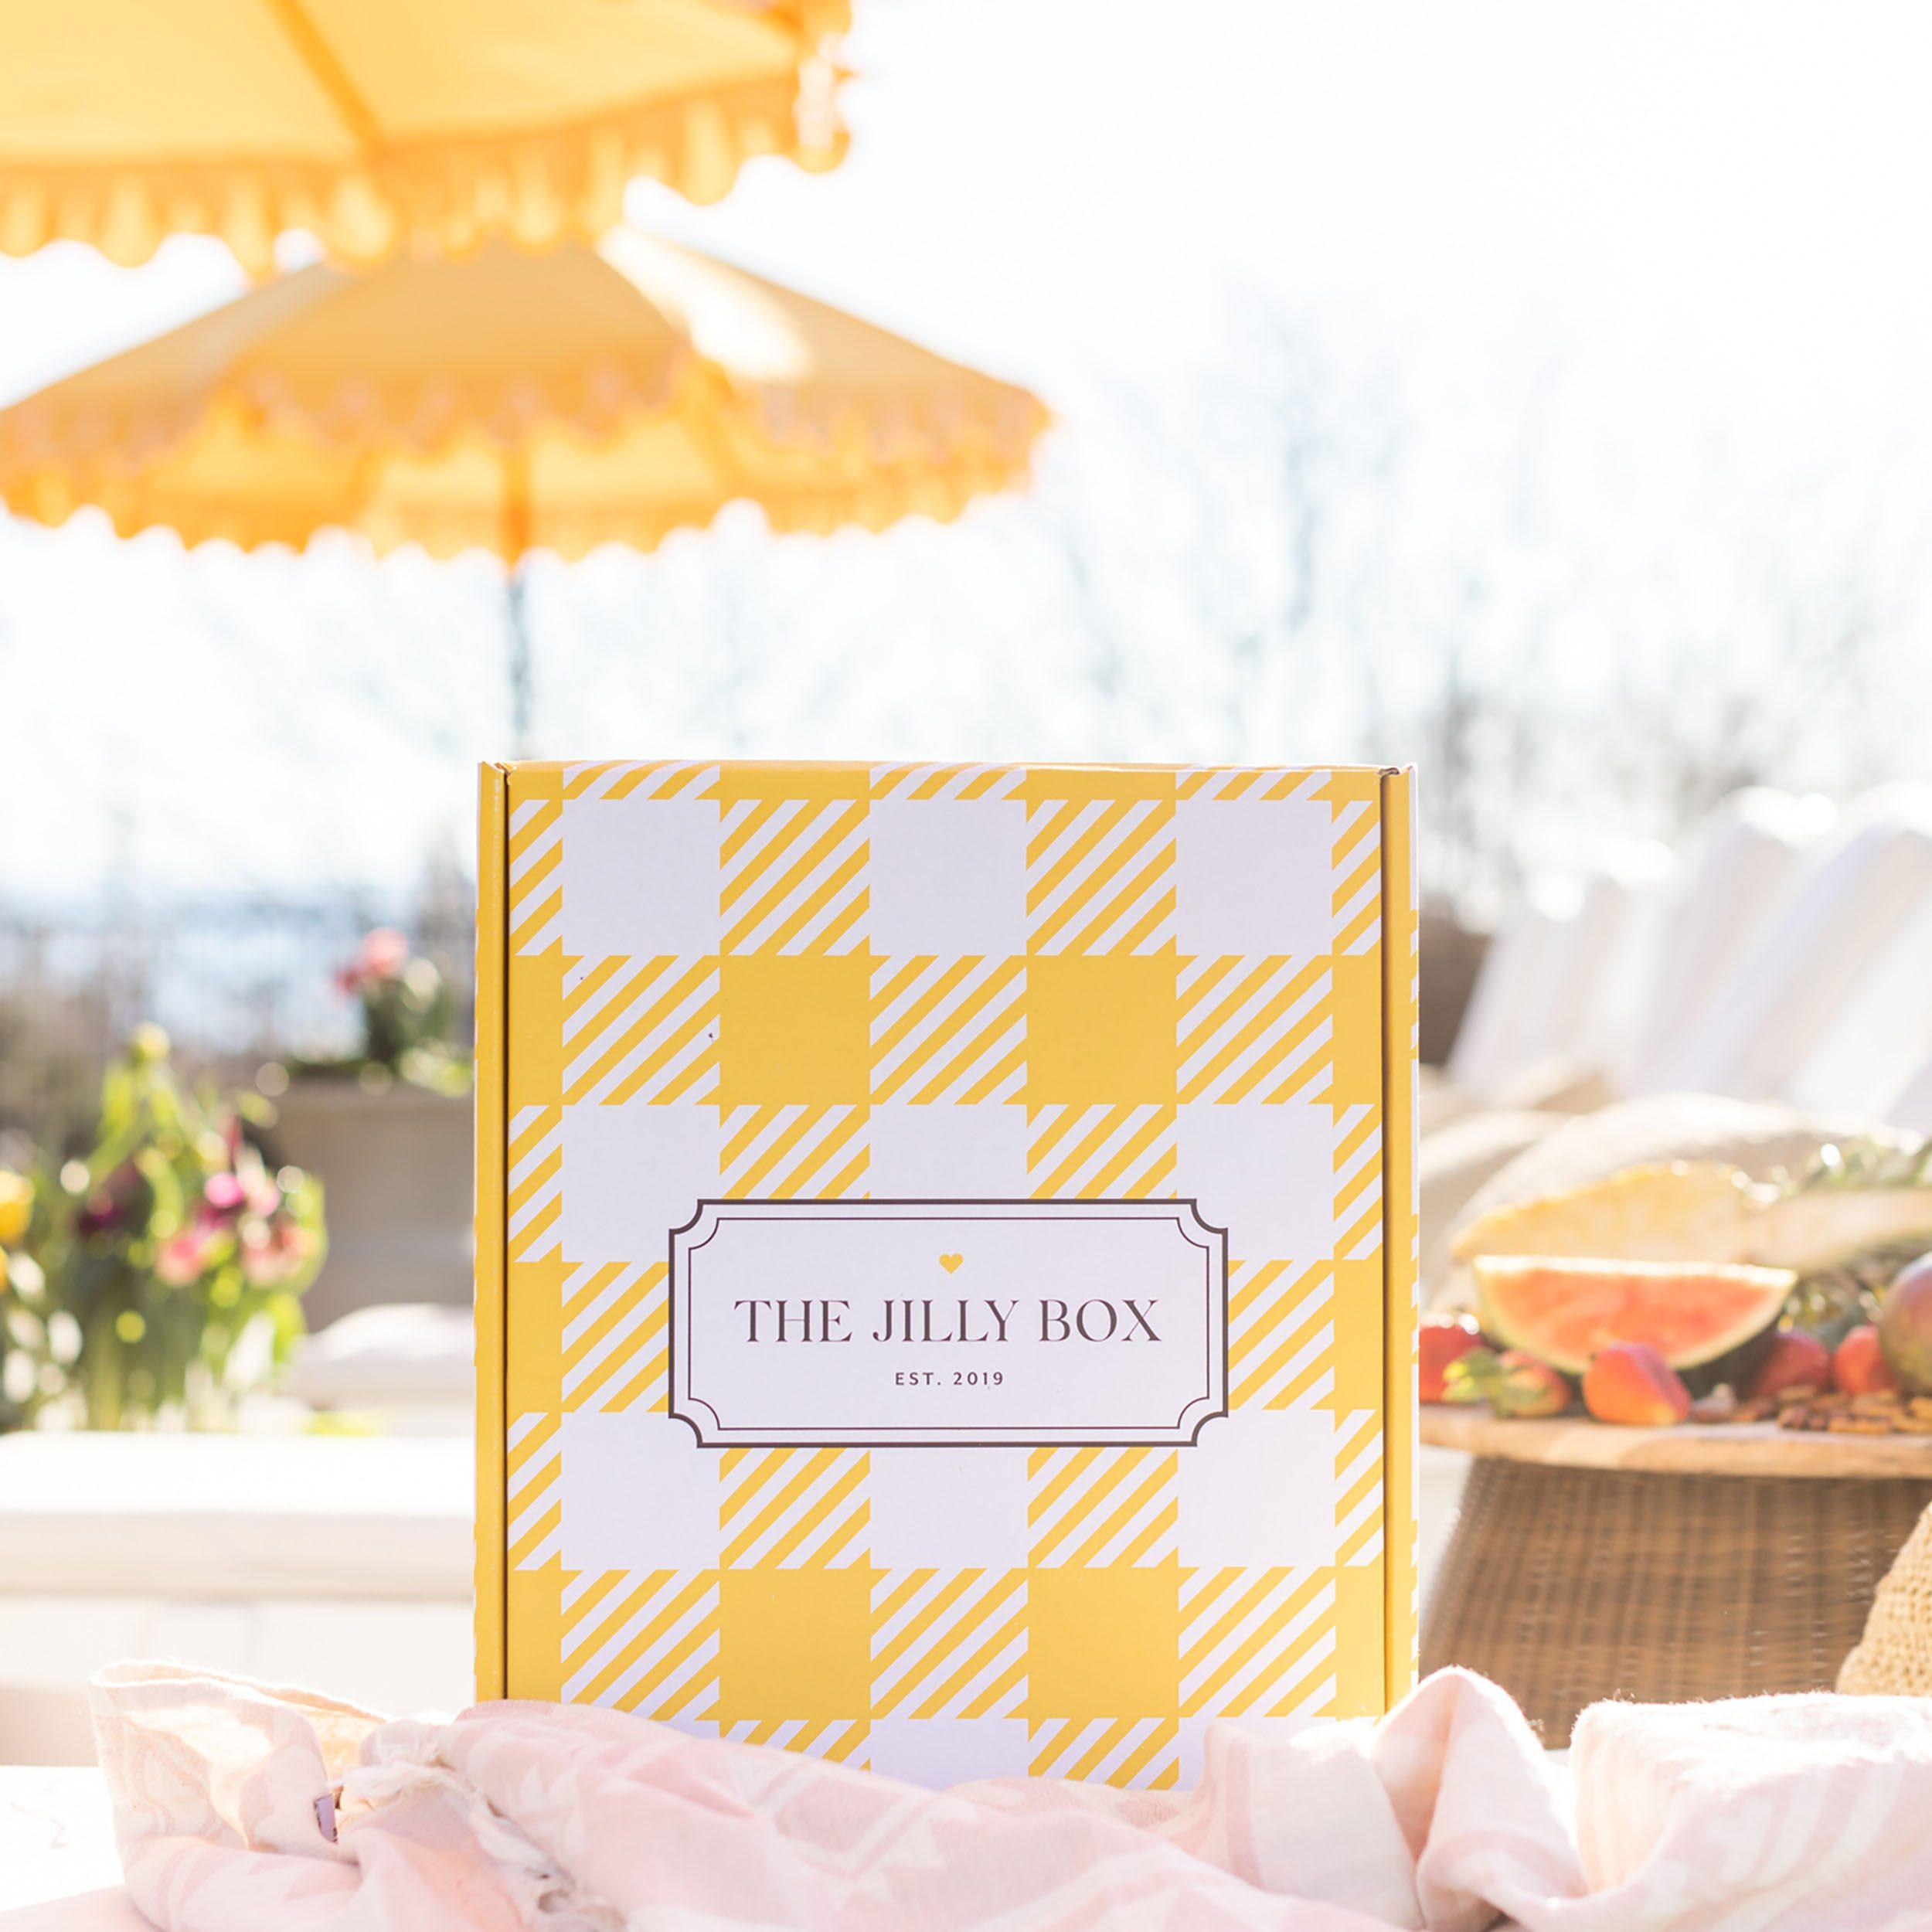 The Summer 2020 Jilly Box